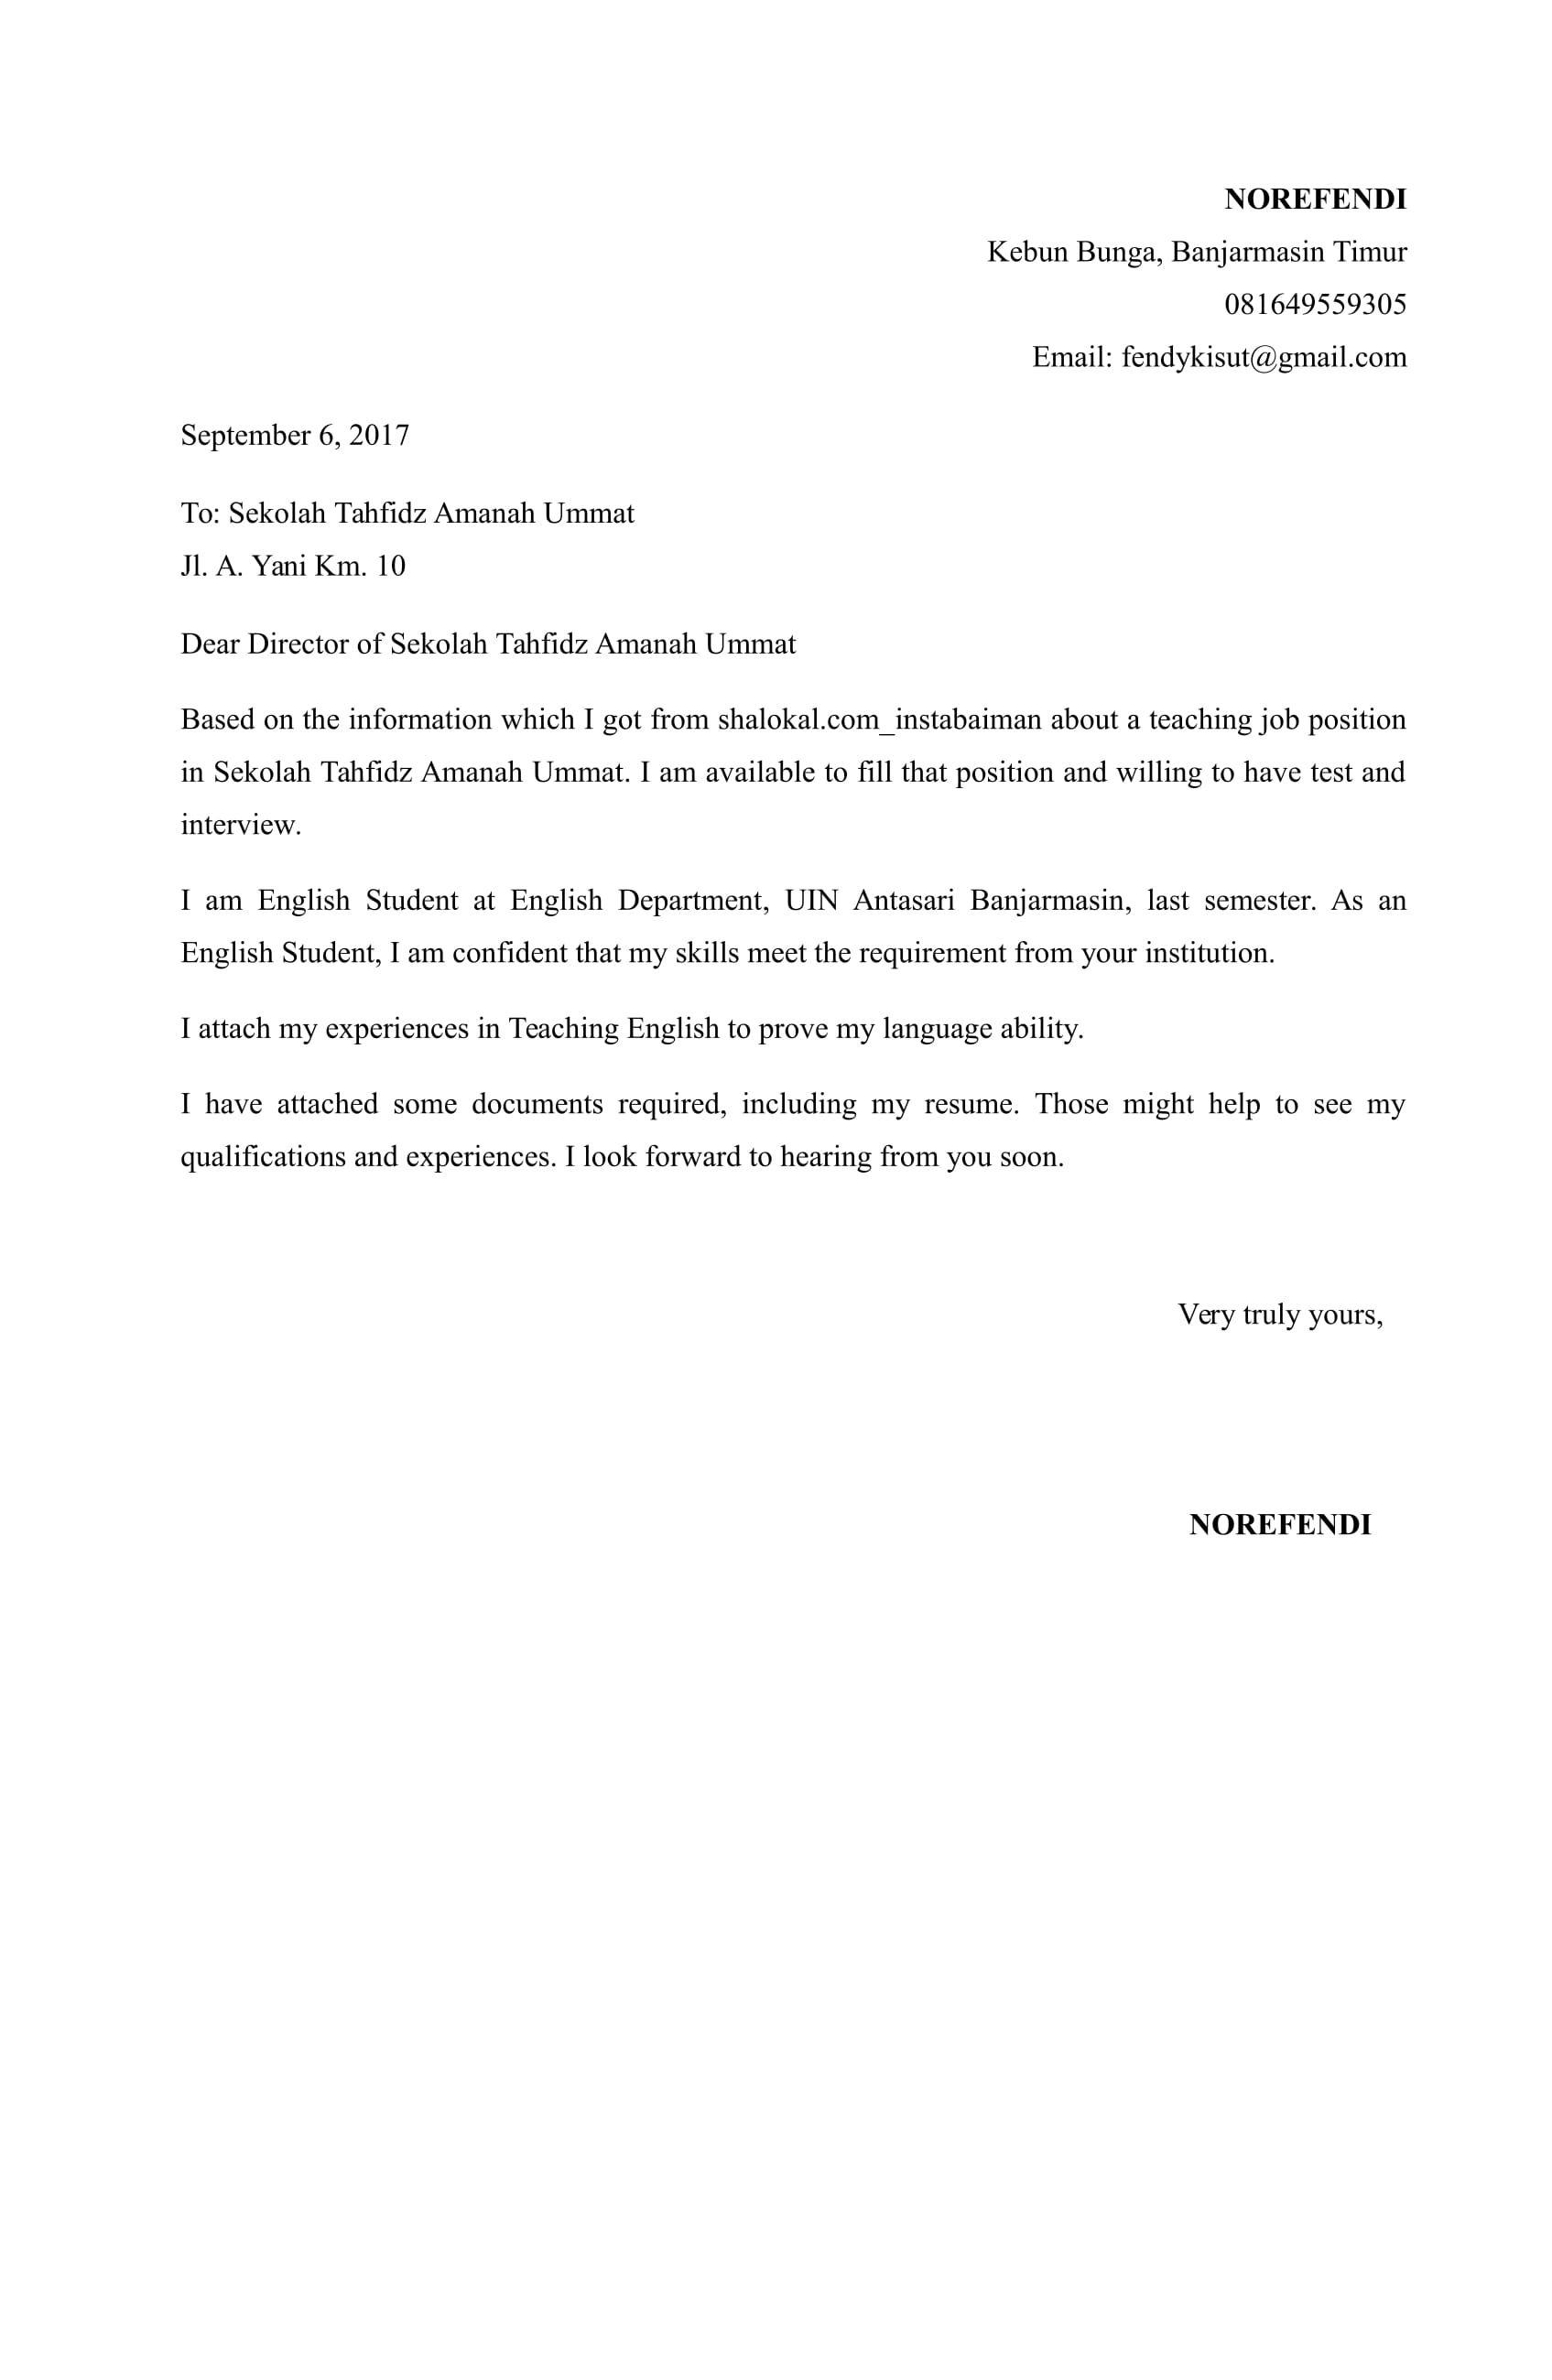 Contoh Surat Lamaran Kerja Versi Bahasa Inggris Download Kumpulan Gambar